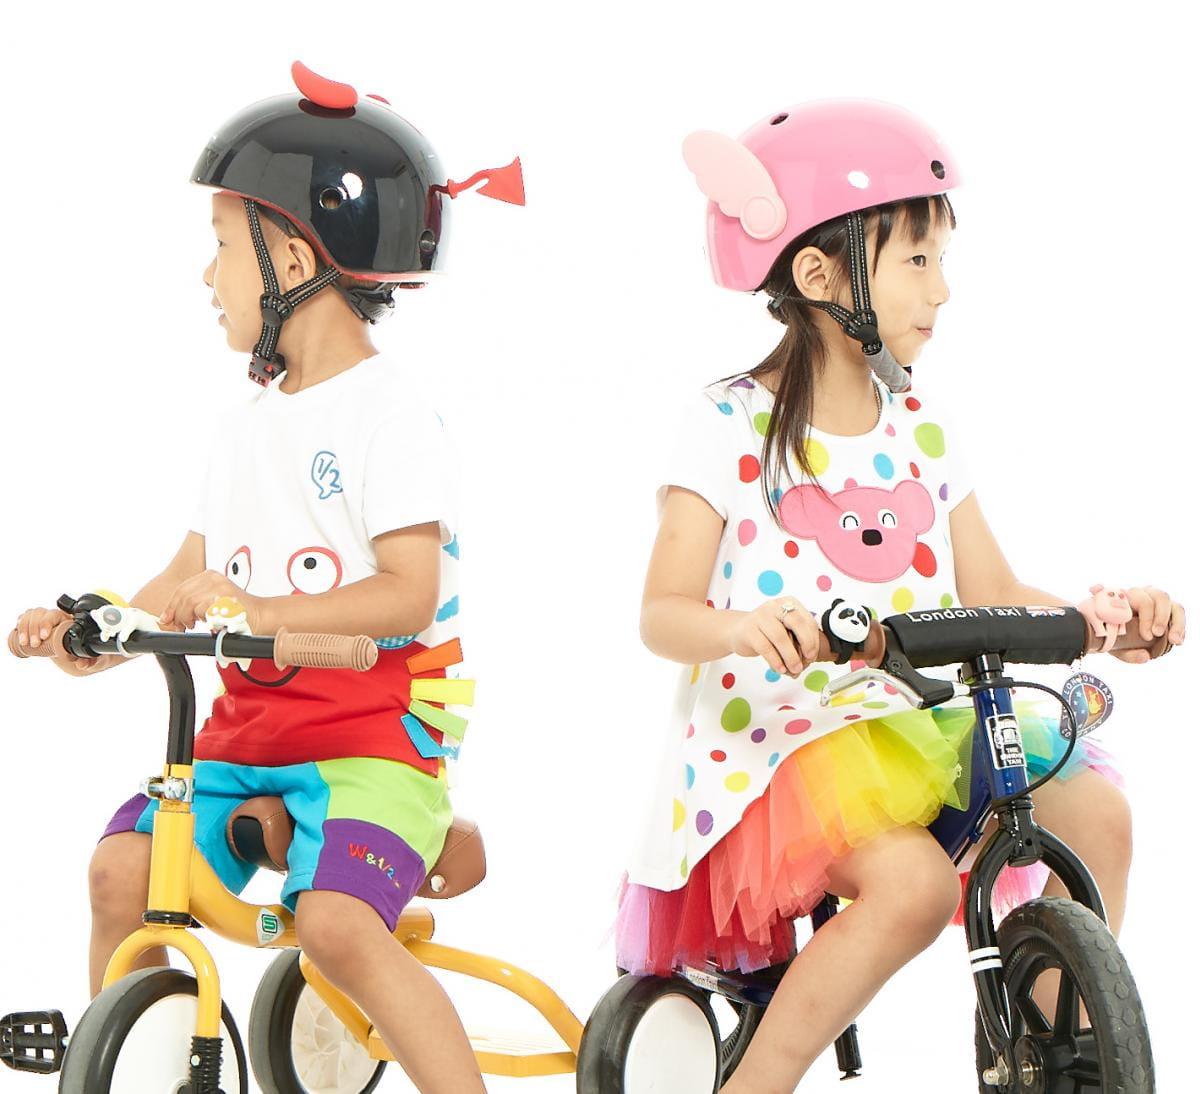 【YIIBOZ】超輕量可調頭圍兒童安全帽/運動頭盔(彩繪款) 5